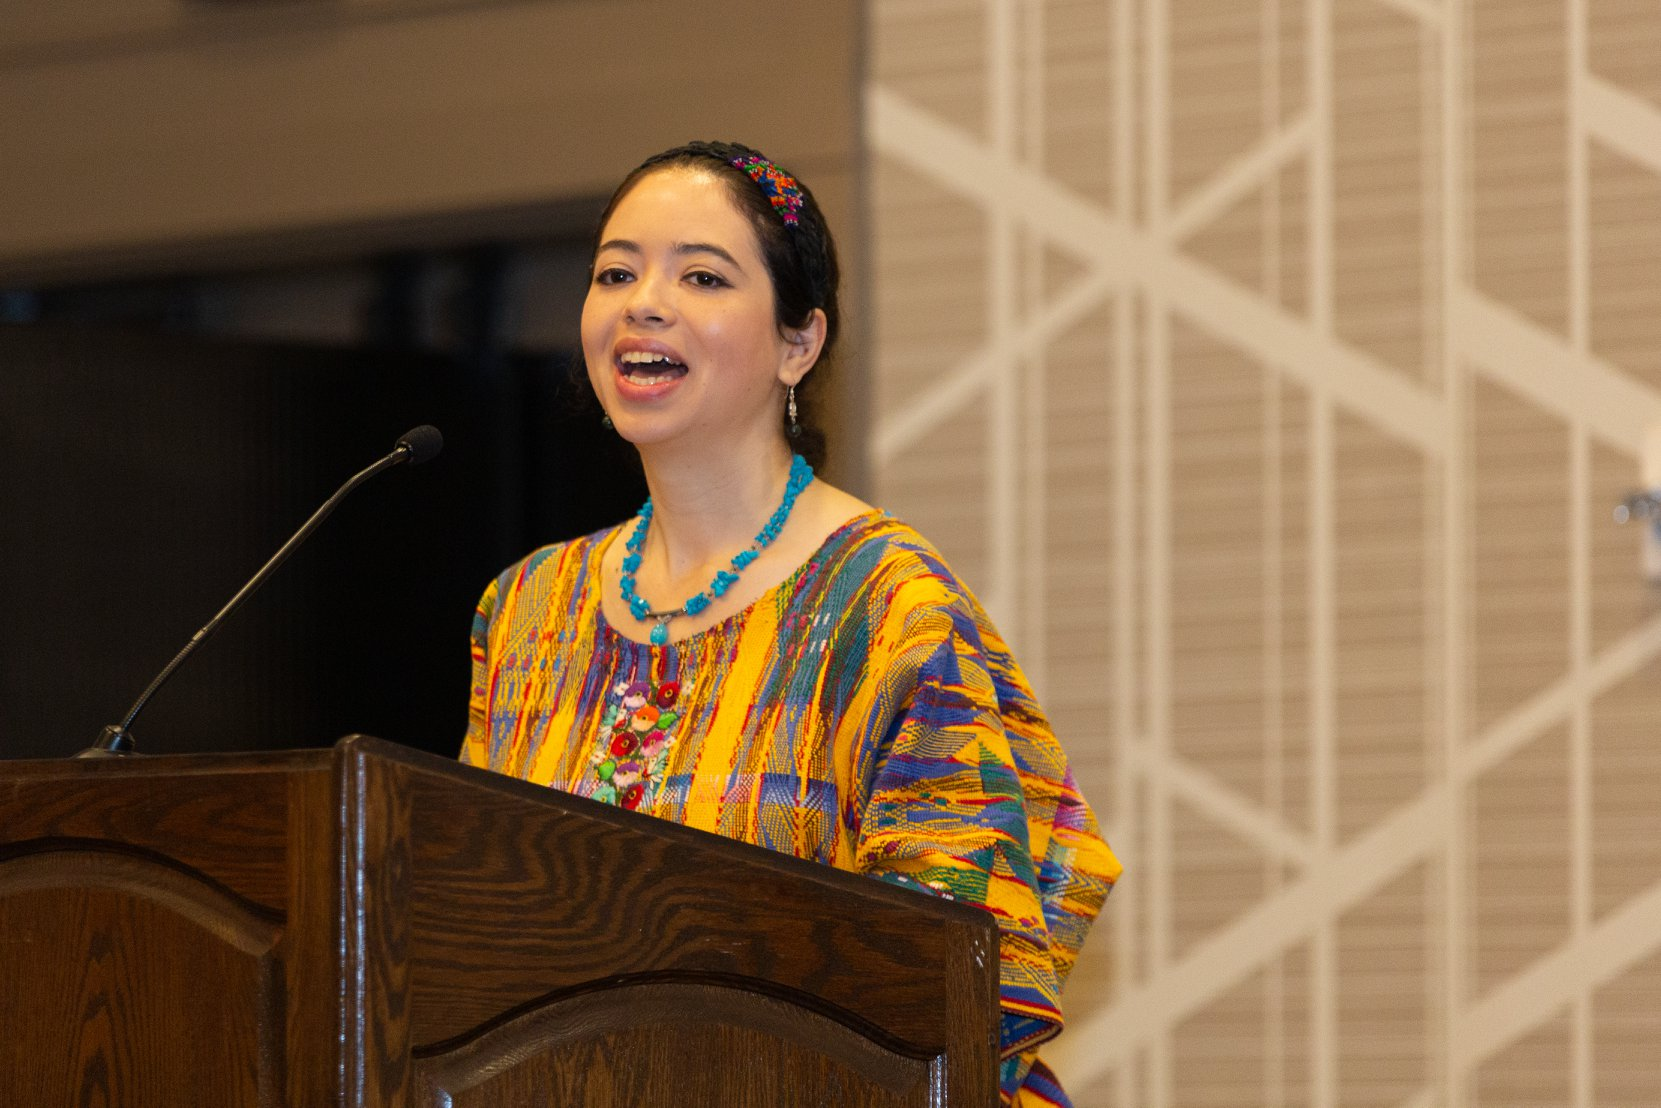 Susana Arrechea ganó premio OWSD-Elsevier para Mujeres Científicas